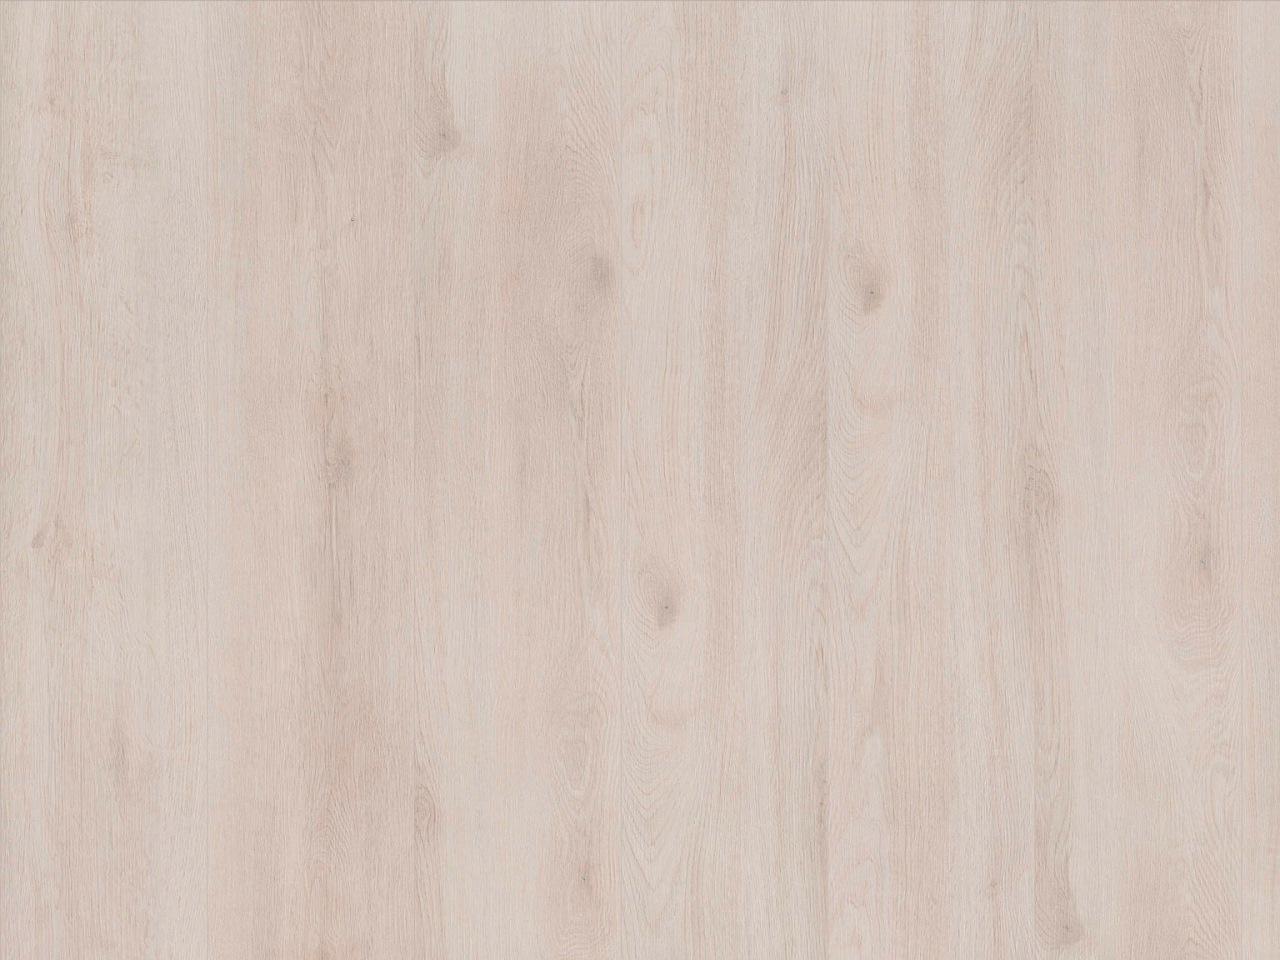 Laminatboden Oak Gallery Format L – Glossy Oak white, LV4179